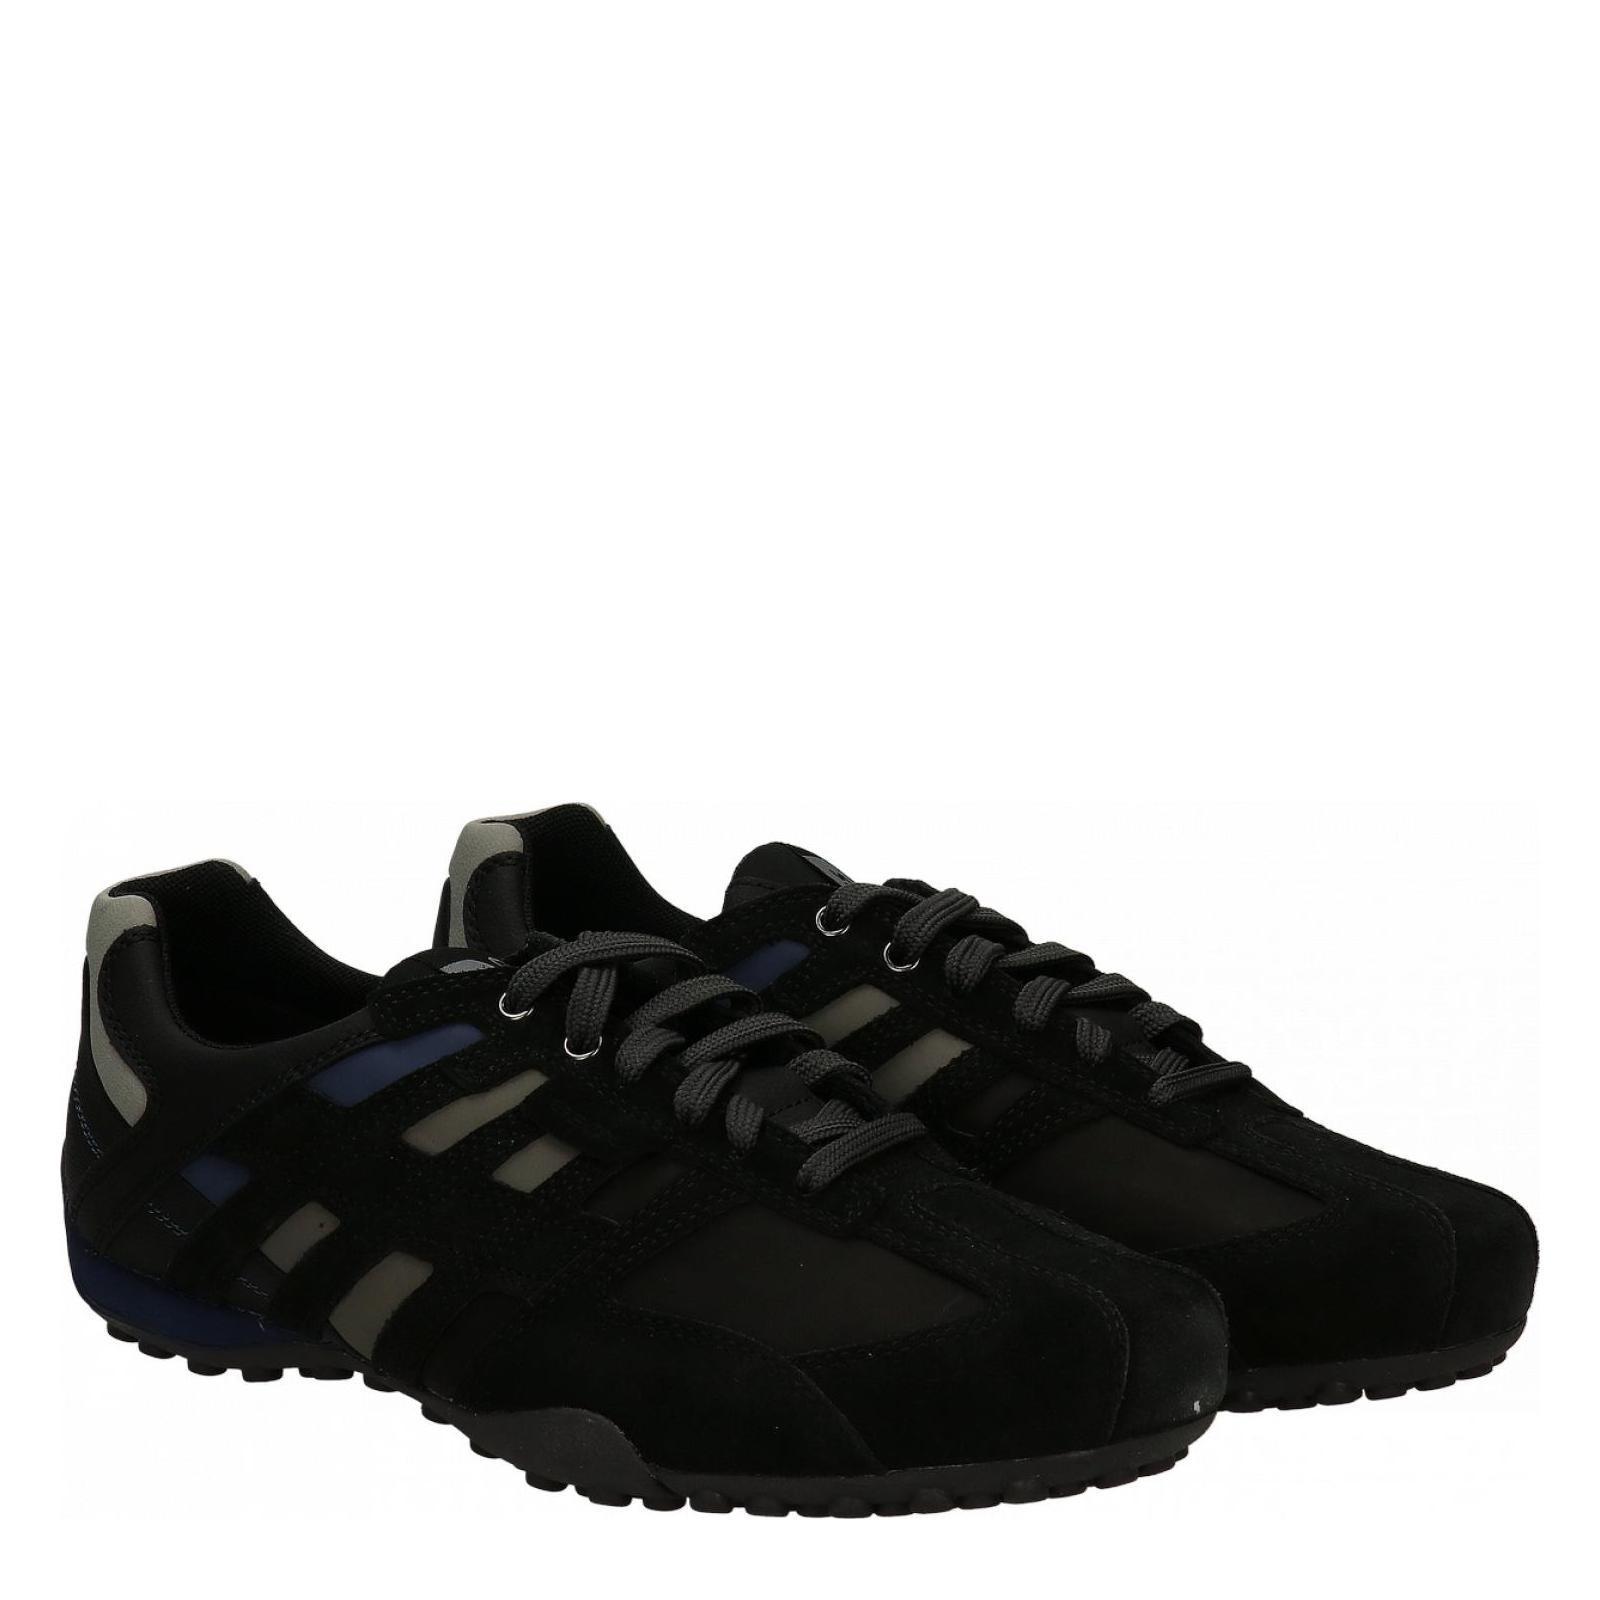 c0052-black-blue